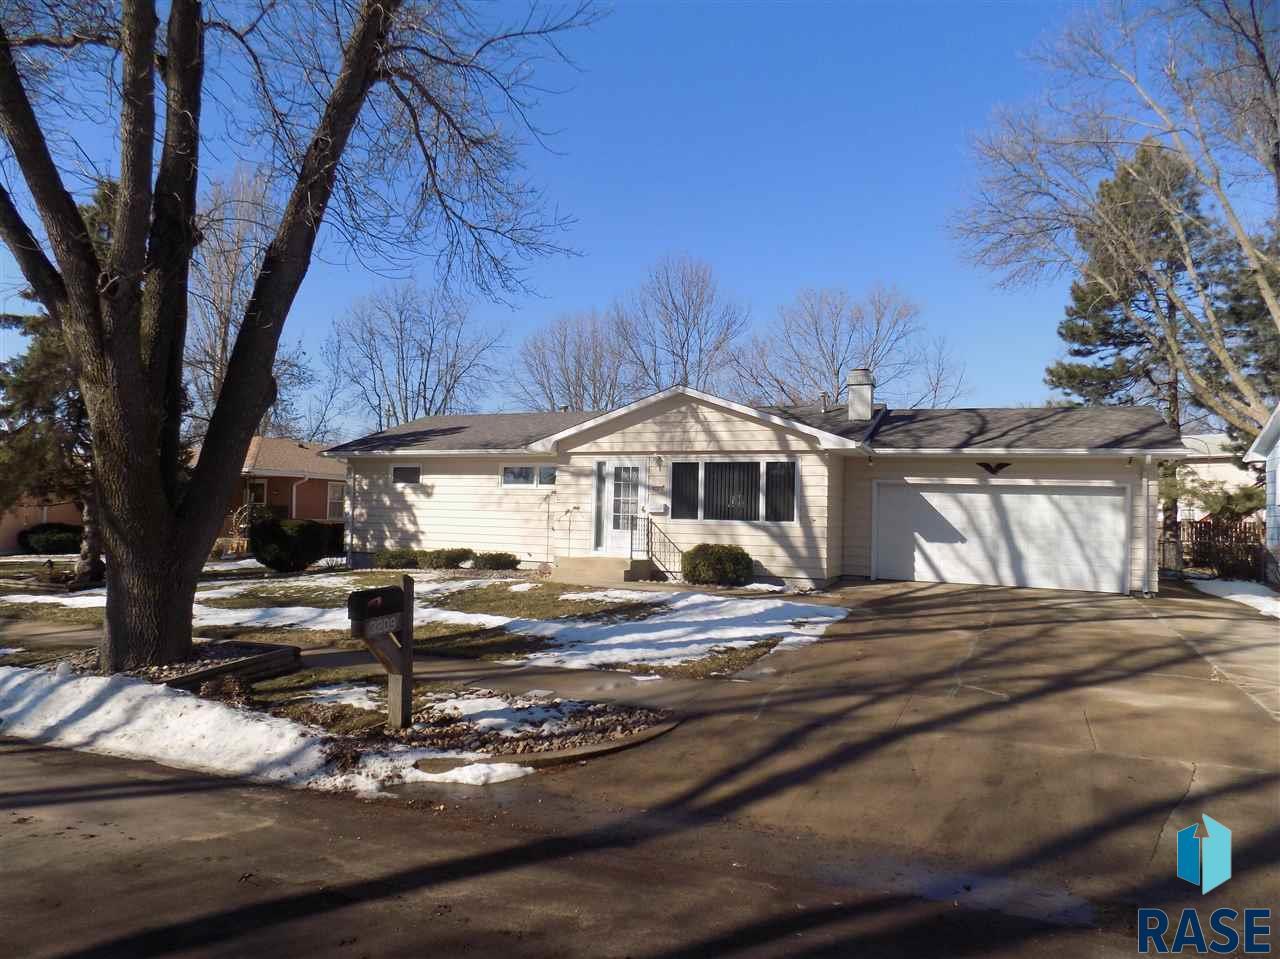 3209 S Garfield Ave, Sioux Falls, SD 57105